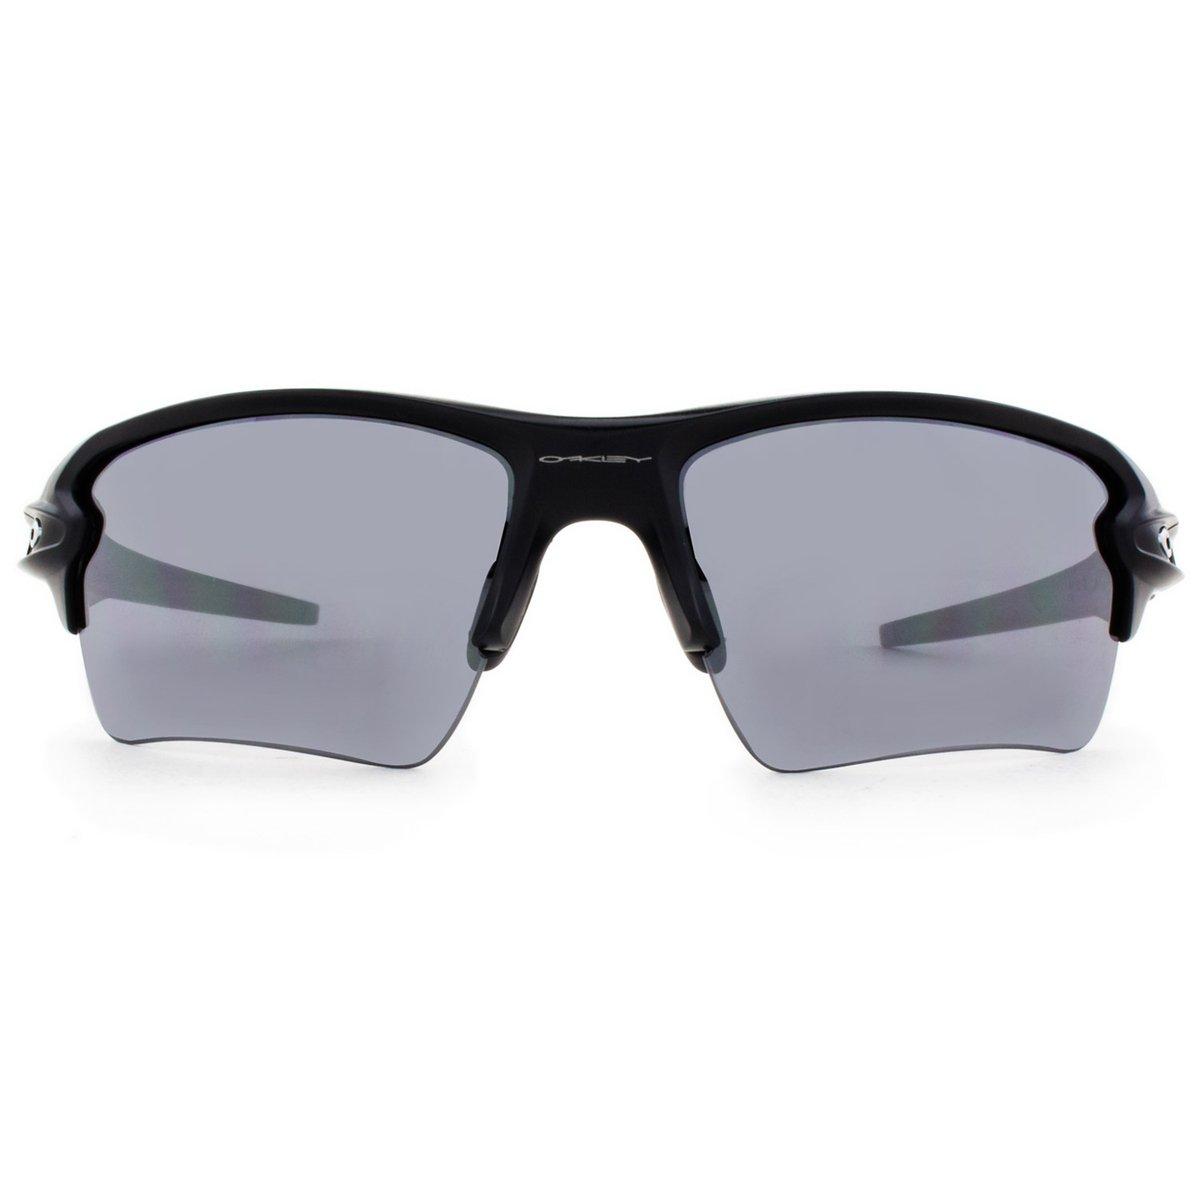 e0e30fc1f4123 Óculos de Sol Oakley Flak 2.0 XL OO9188 01-59 Masculino - Compre Agora    Netshoes